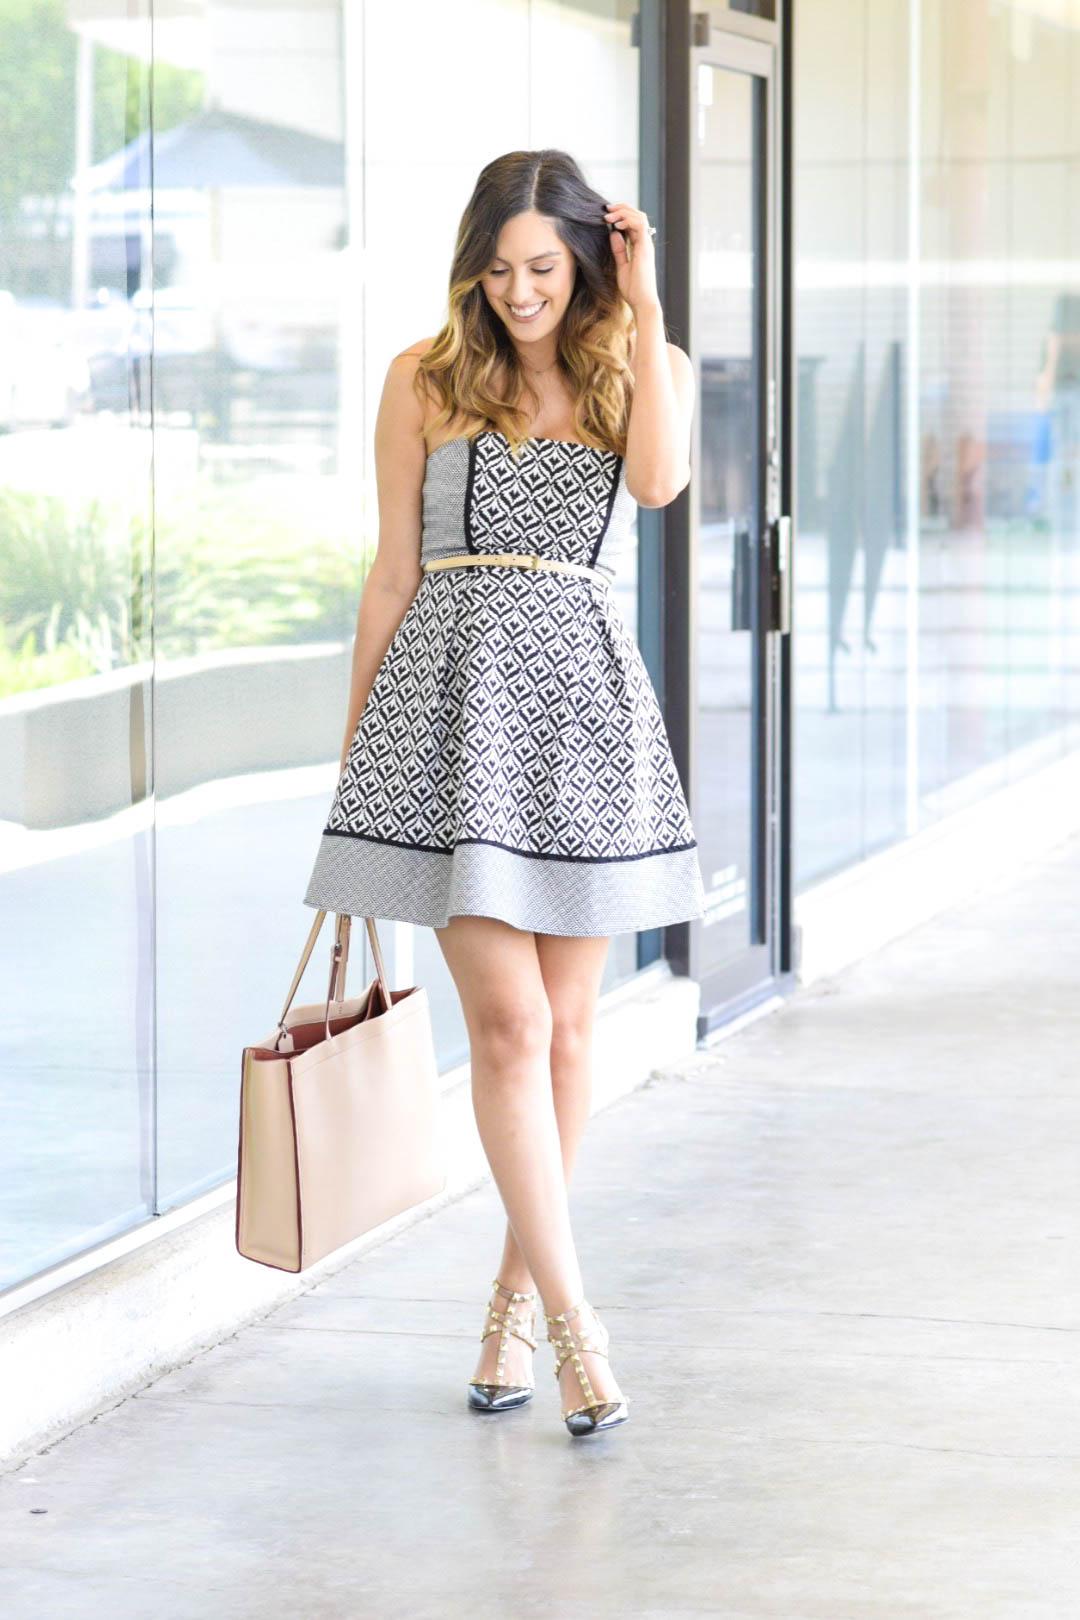 style the girl pattern dress 2